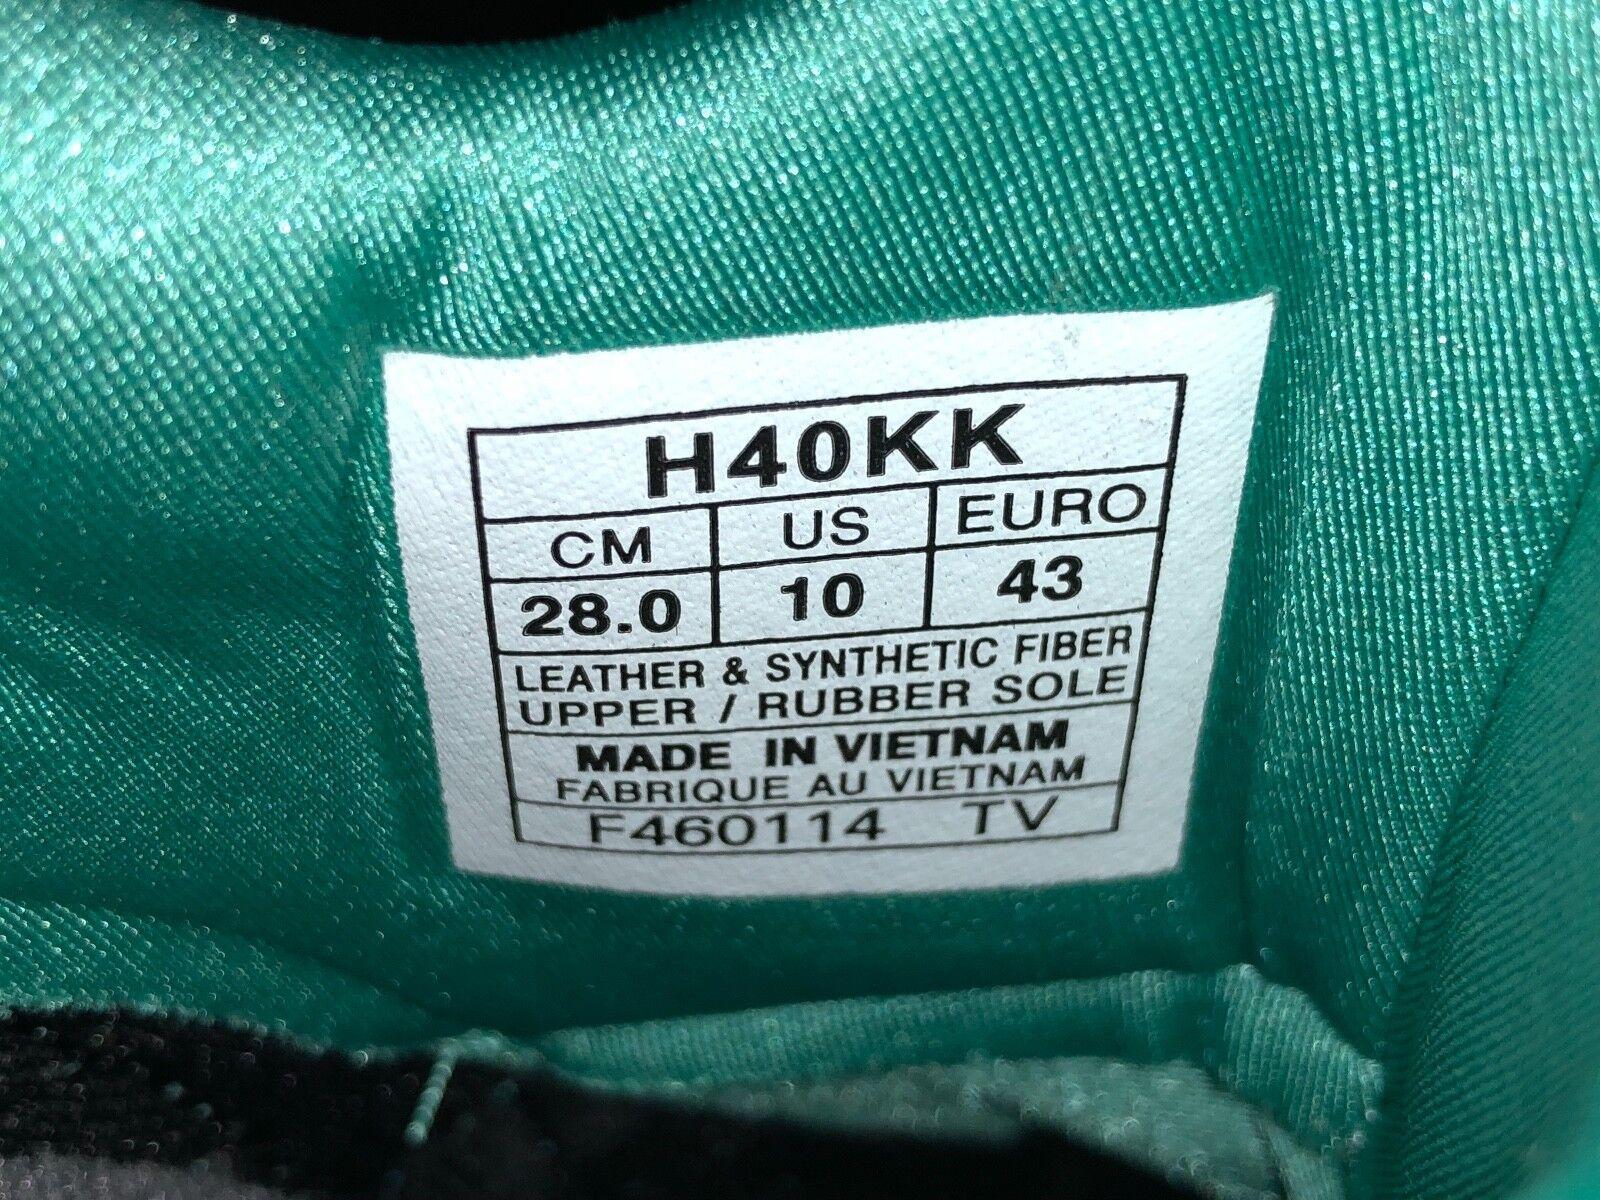 Asics x kith kith kith gel lyte v - h40kk 8686 größe 10 ds e5e064